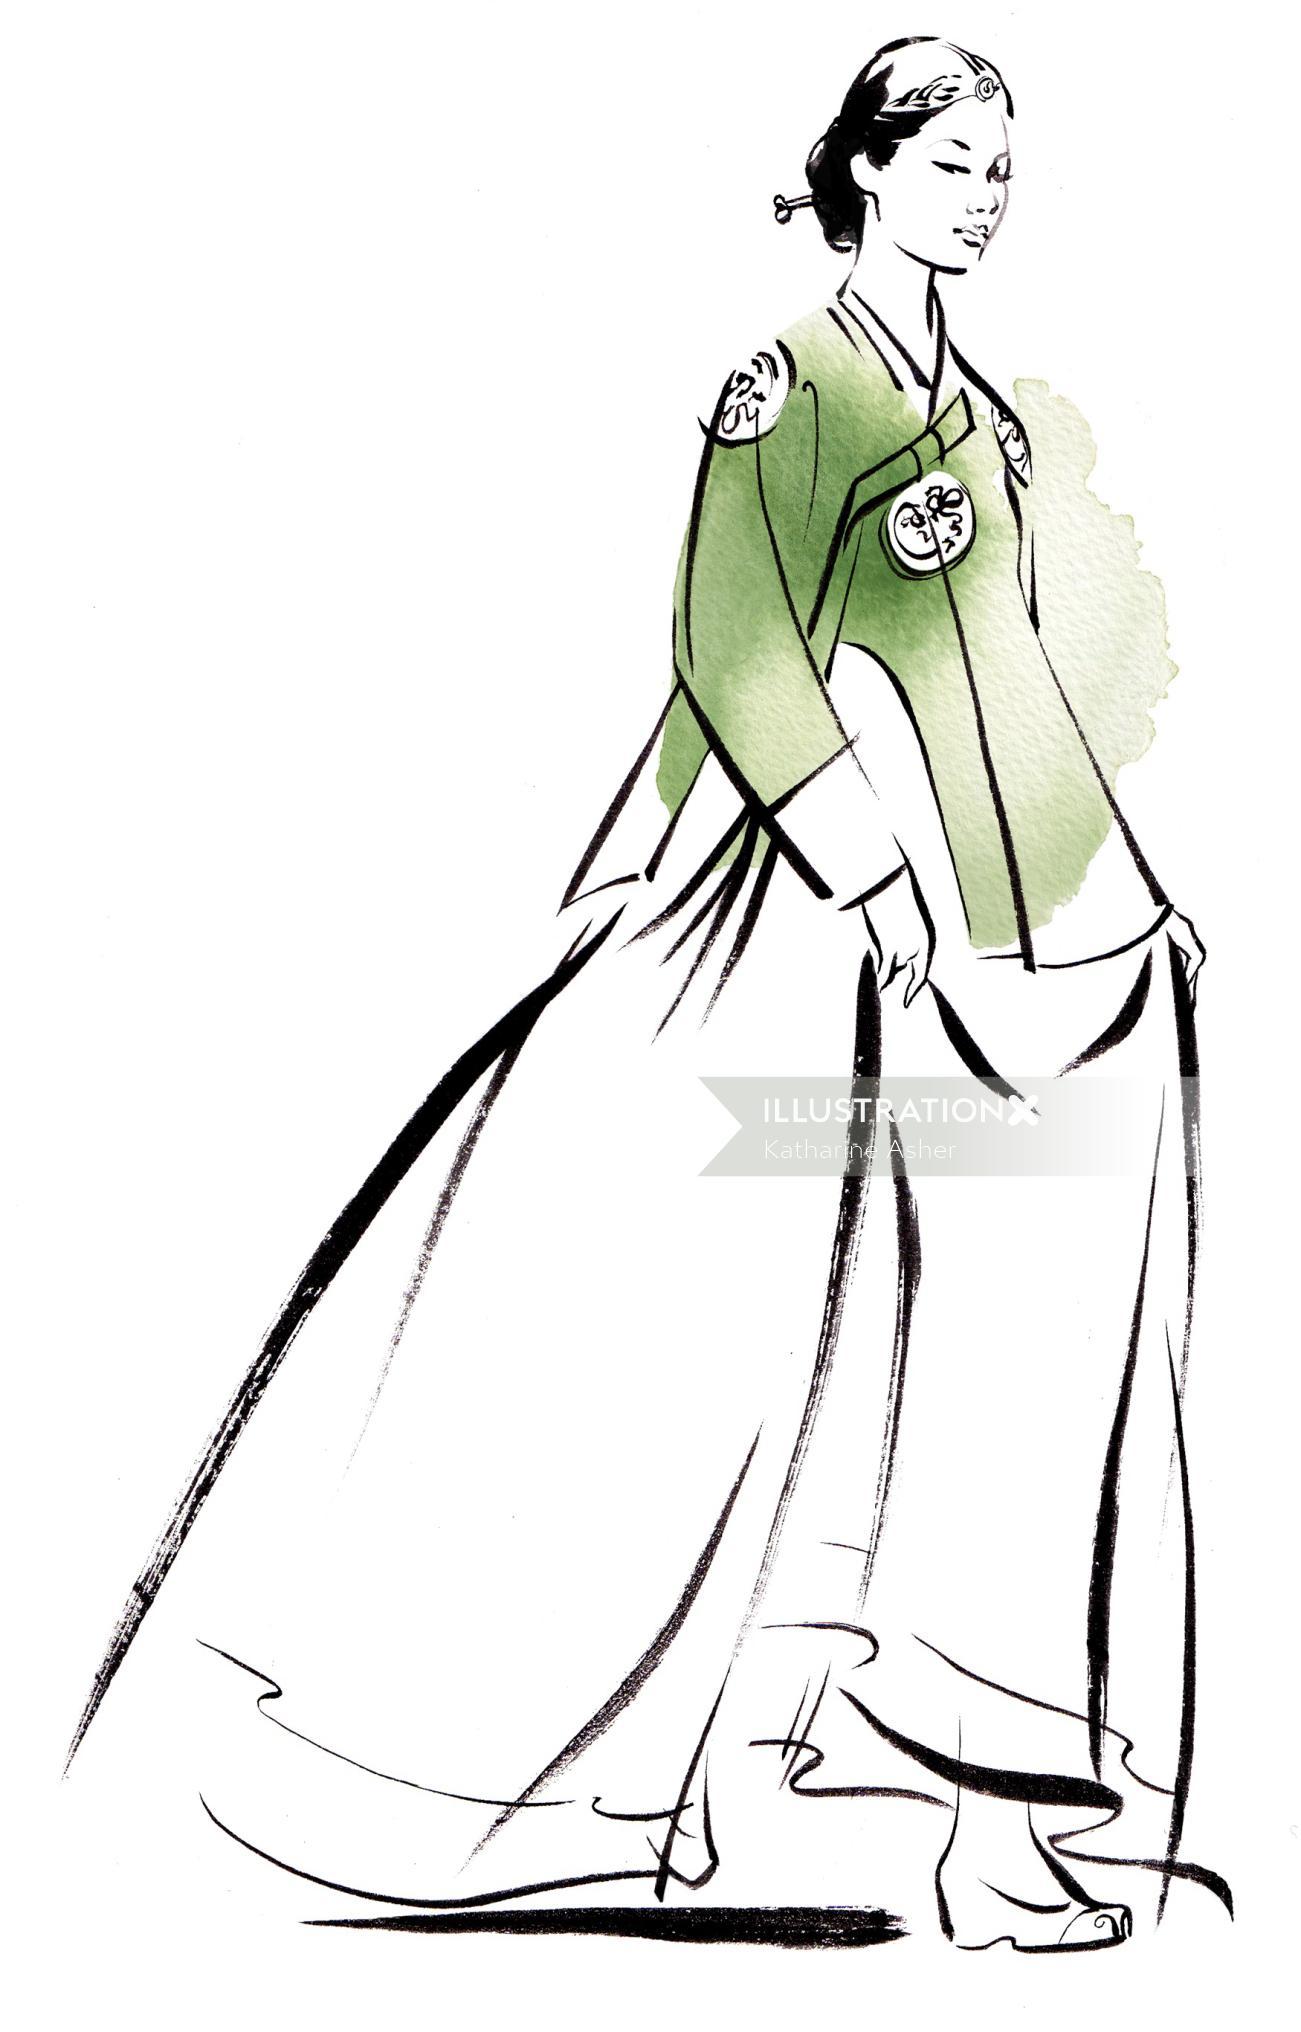 Hanbok fashion illustration by Katharine Asher